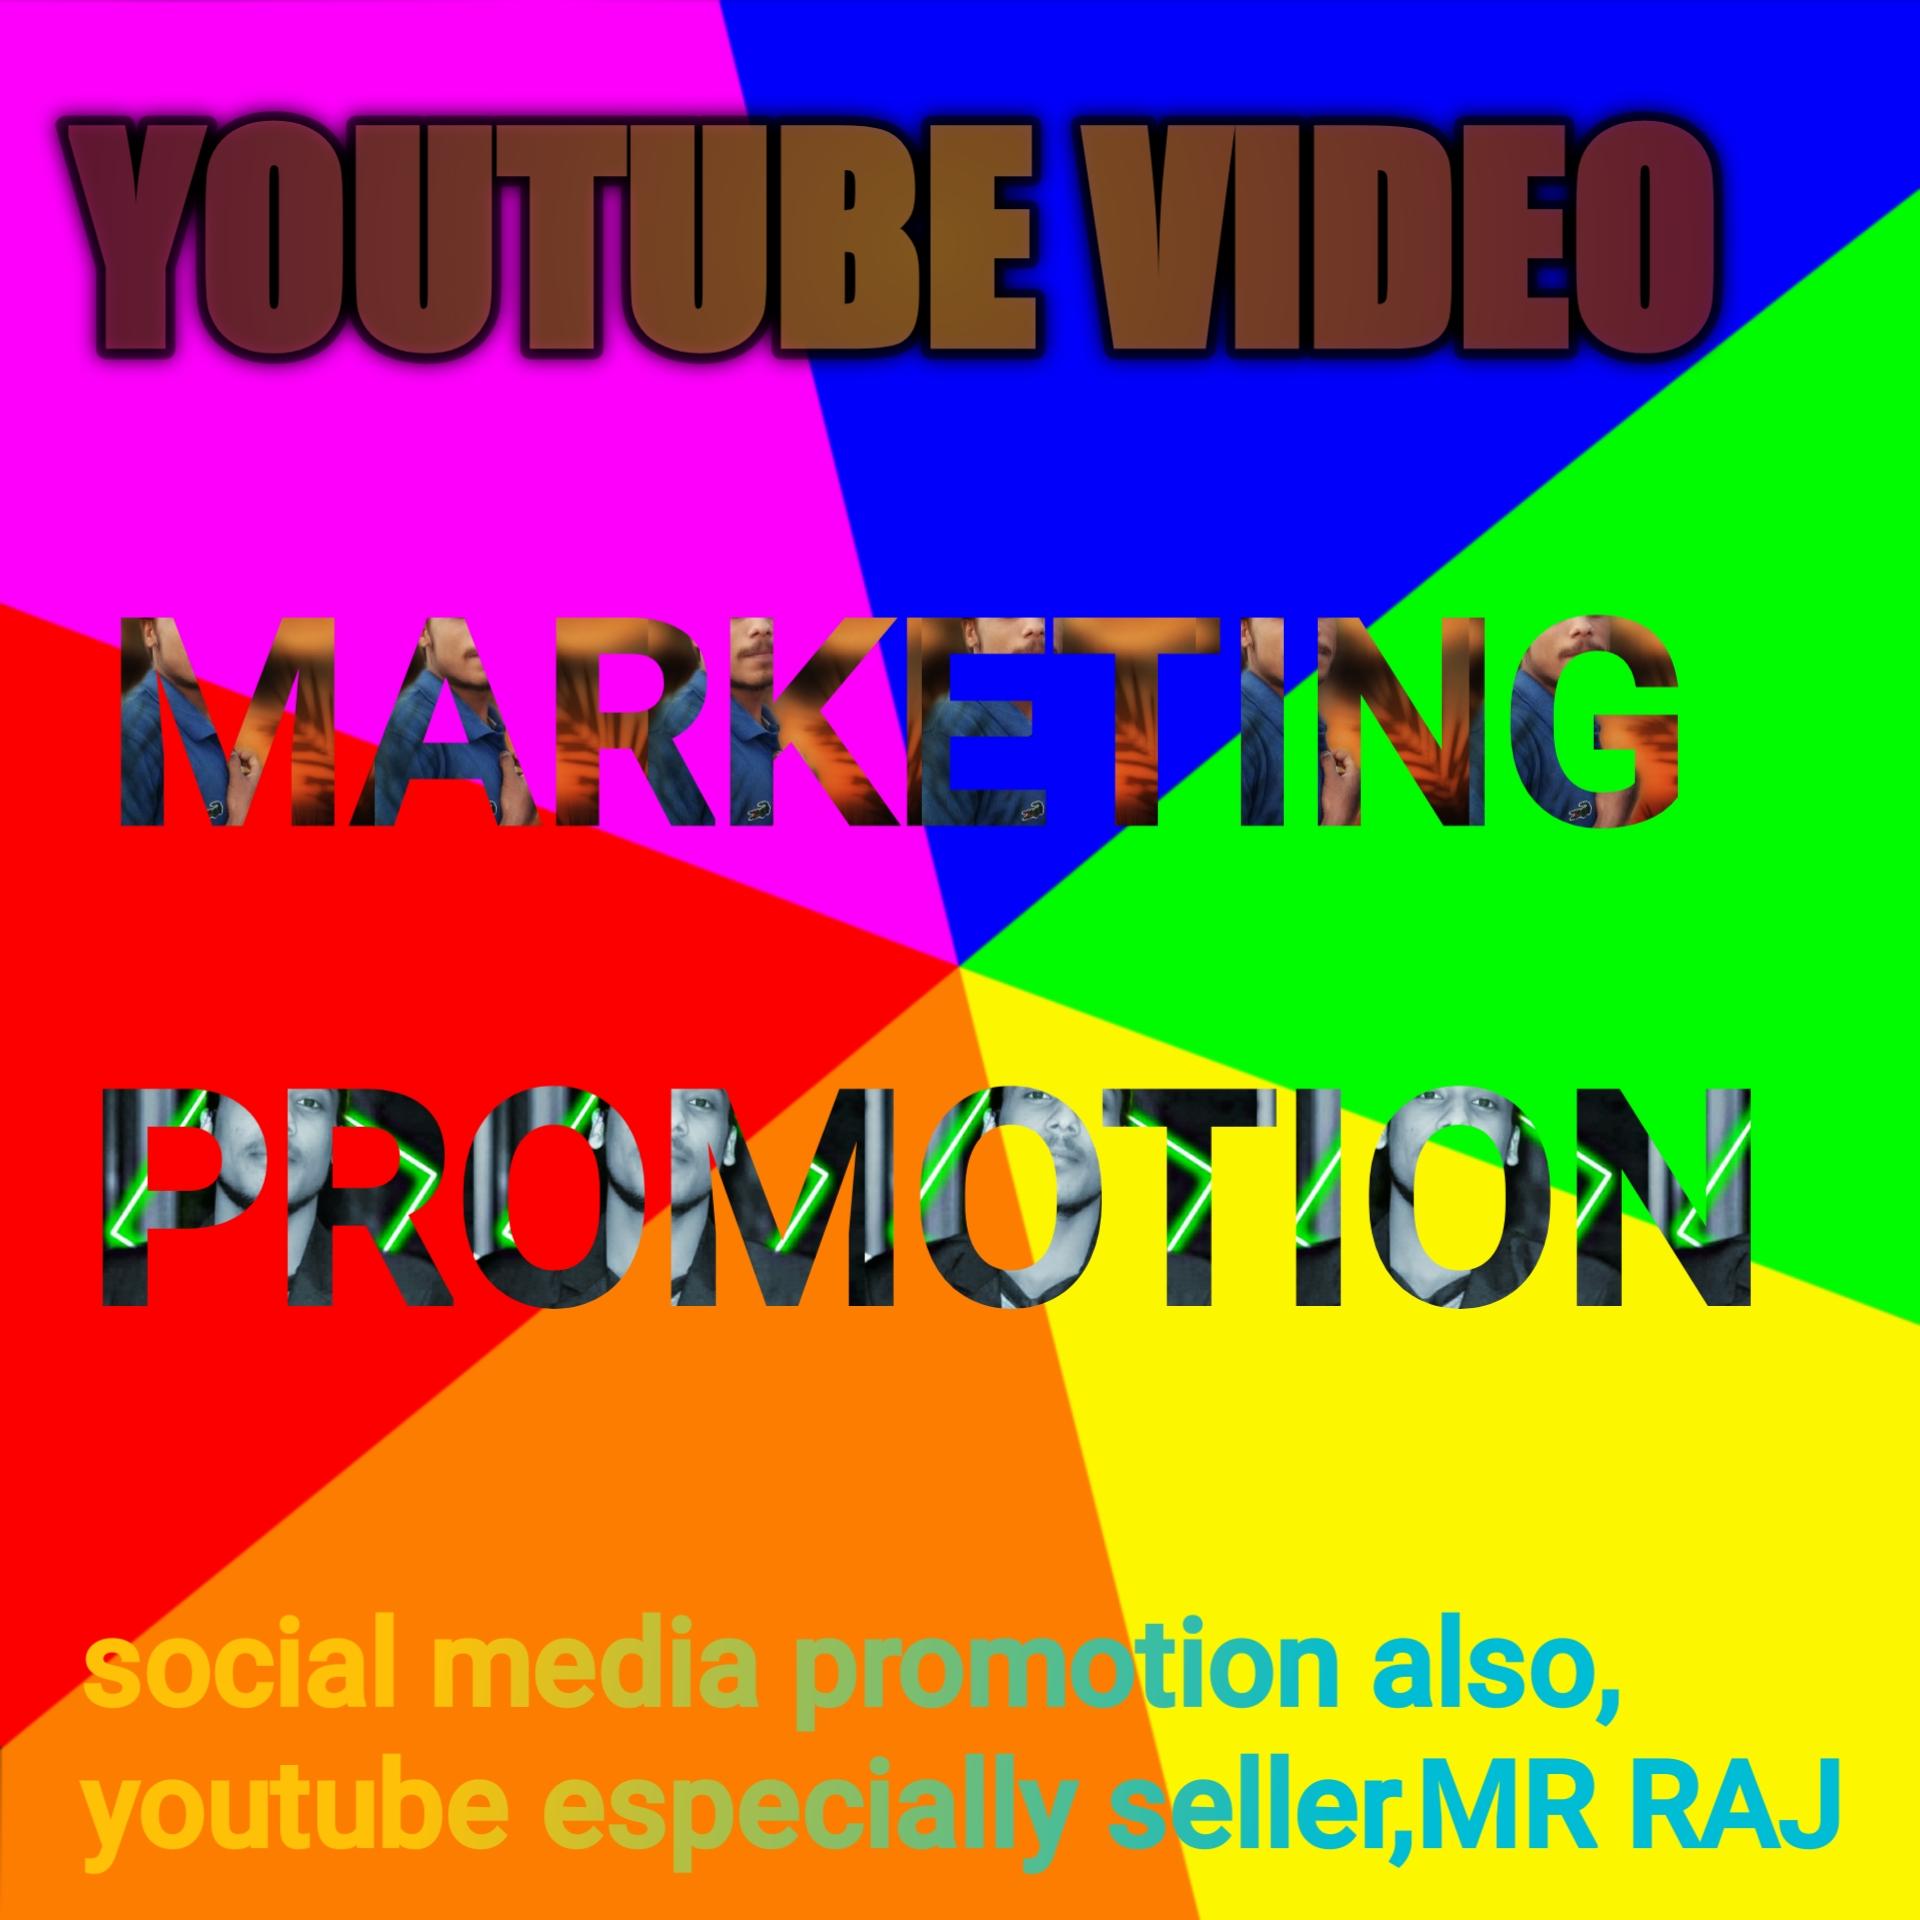 YouTube video marketing promotion.